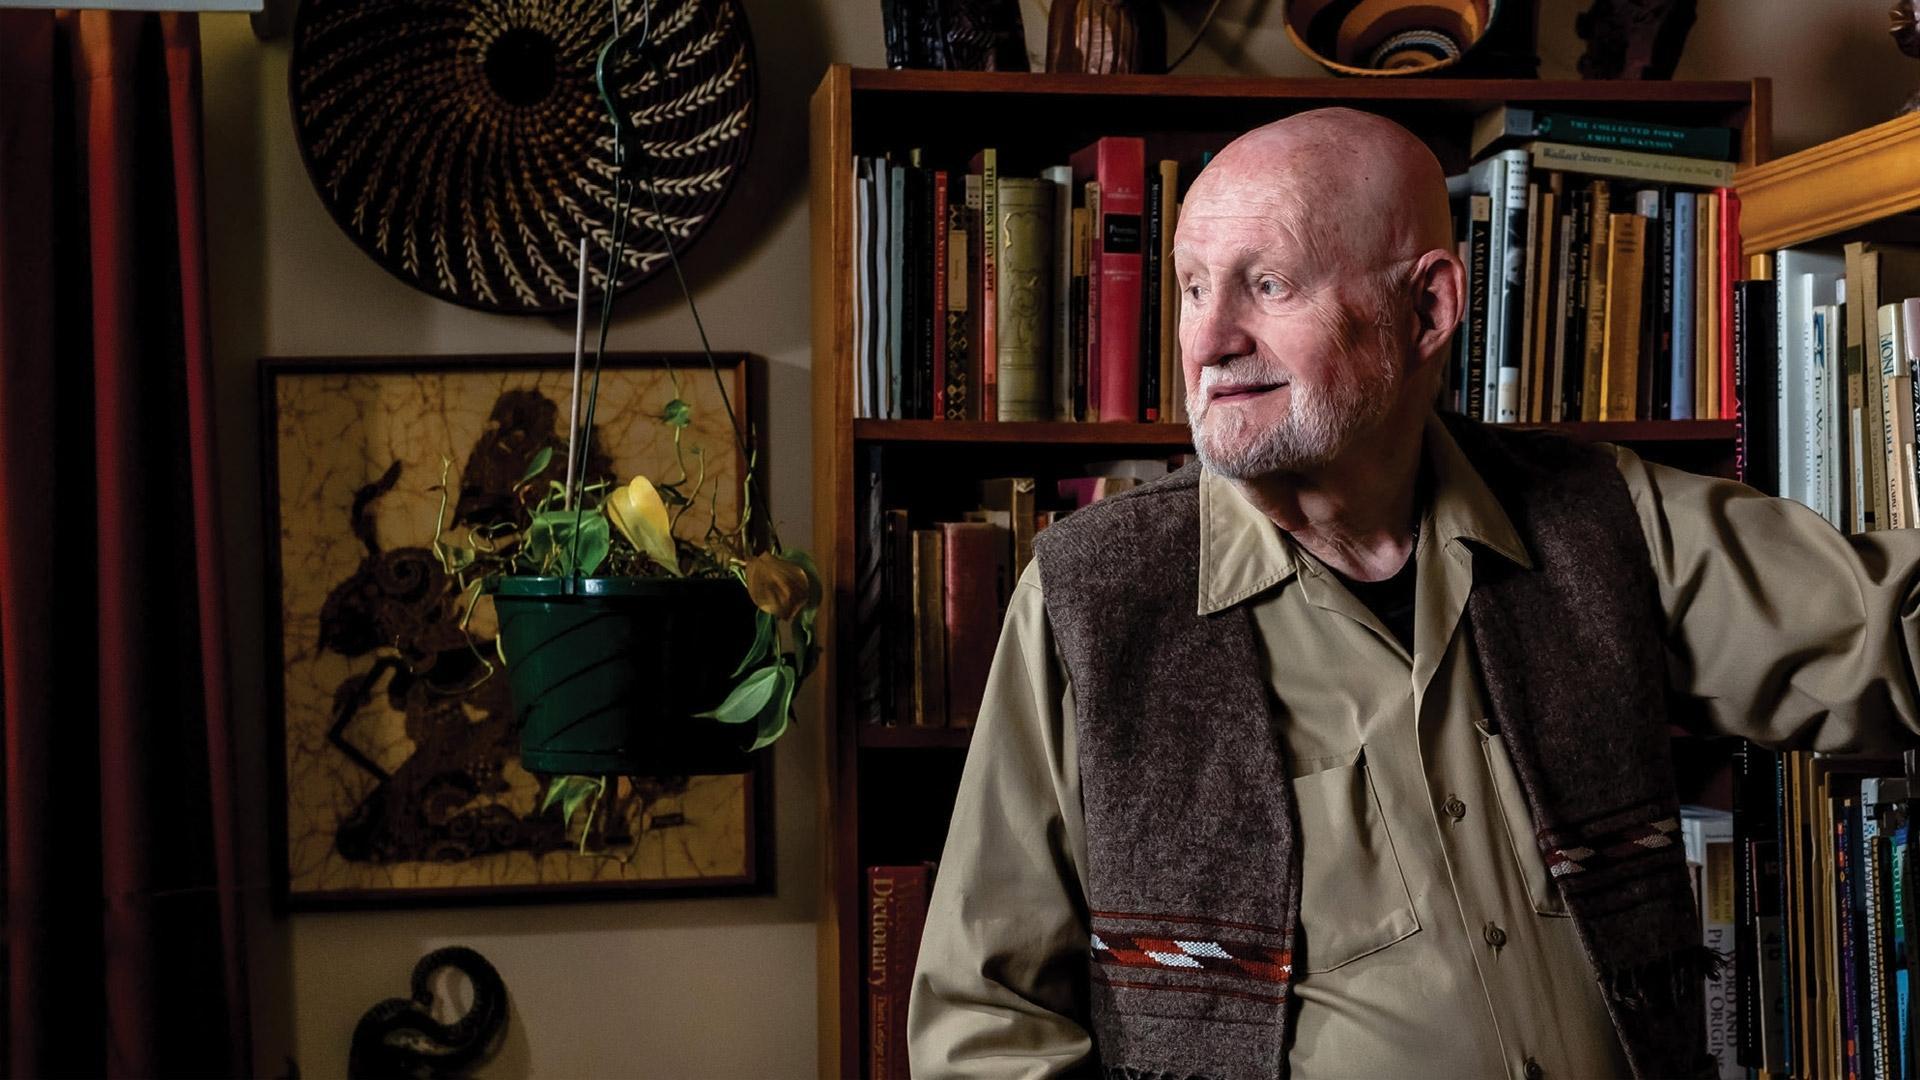 Douglas Raybeck, Professor of Anthropology (1970-2007)